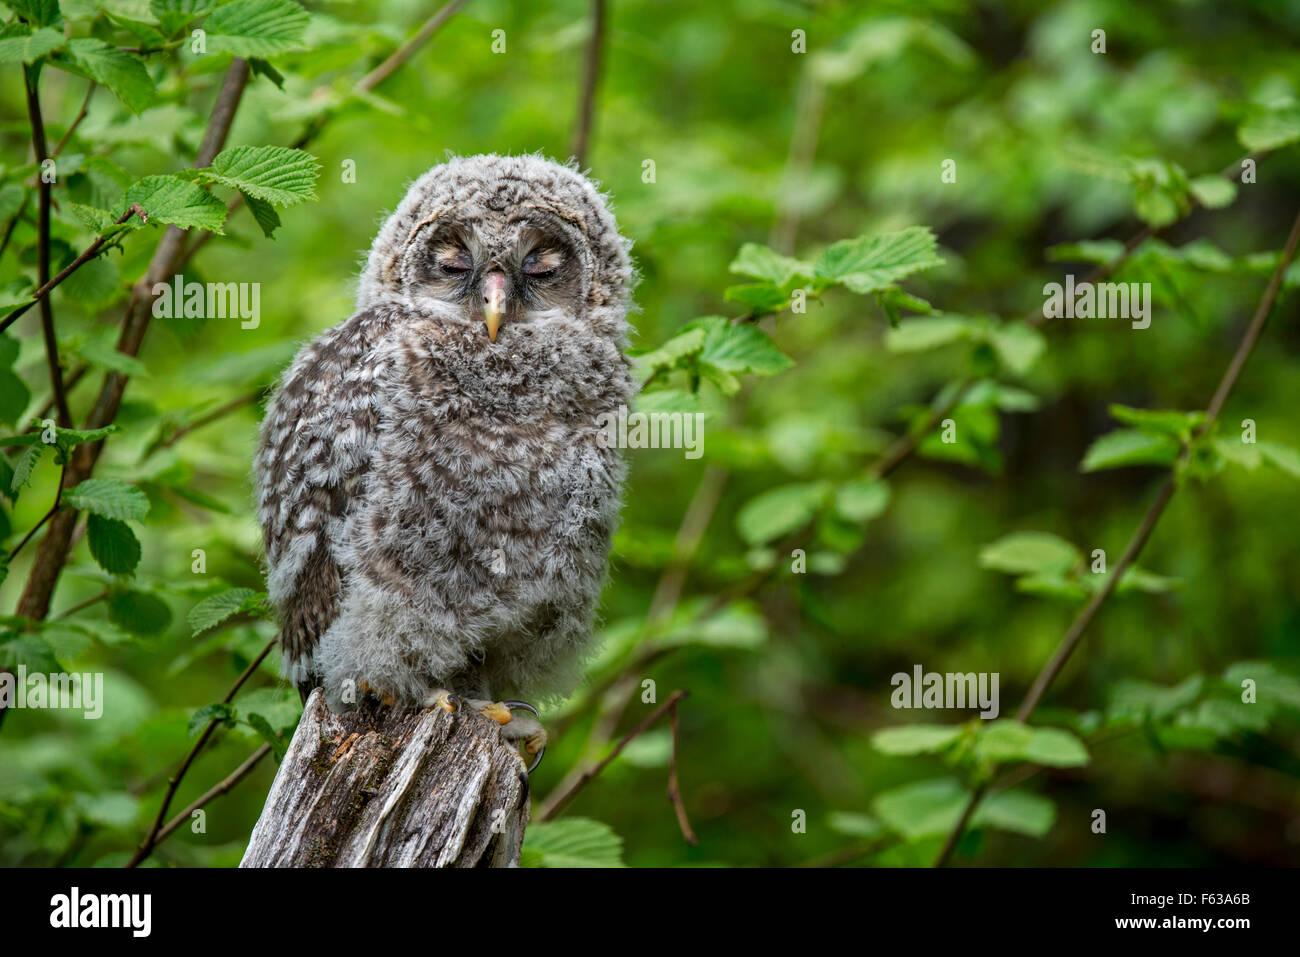 Ural owl (Strix uralensis) fledgling sleeping on tree stump in forest - Stock Image